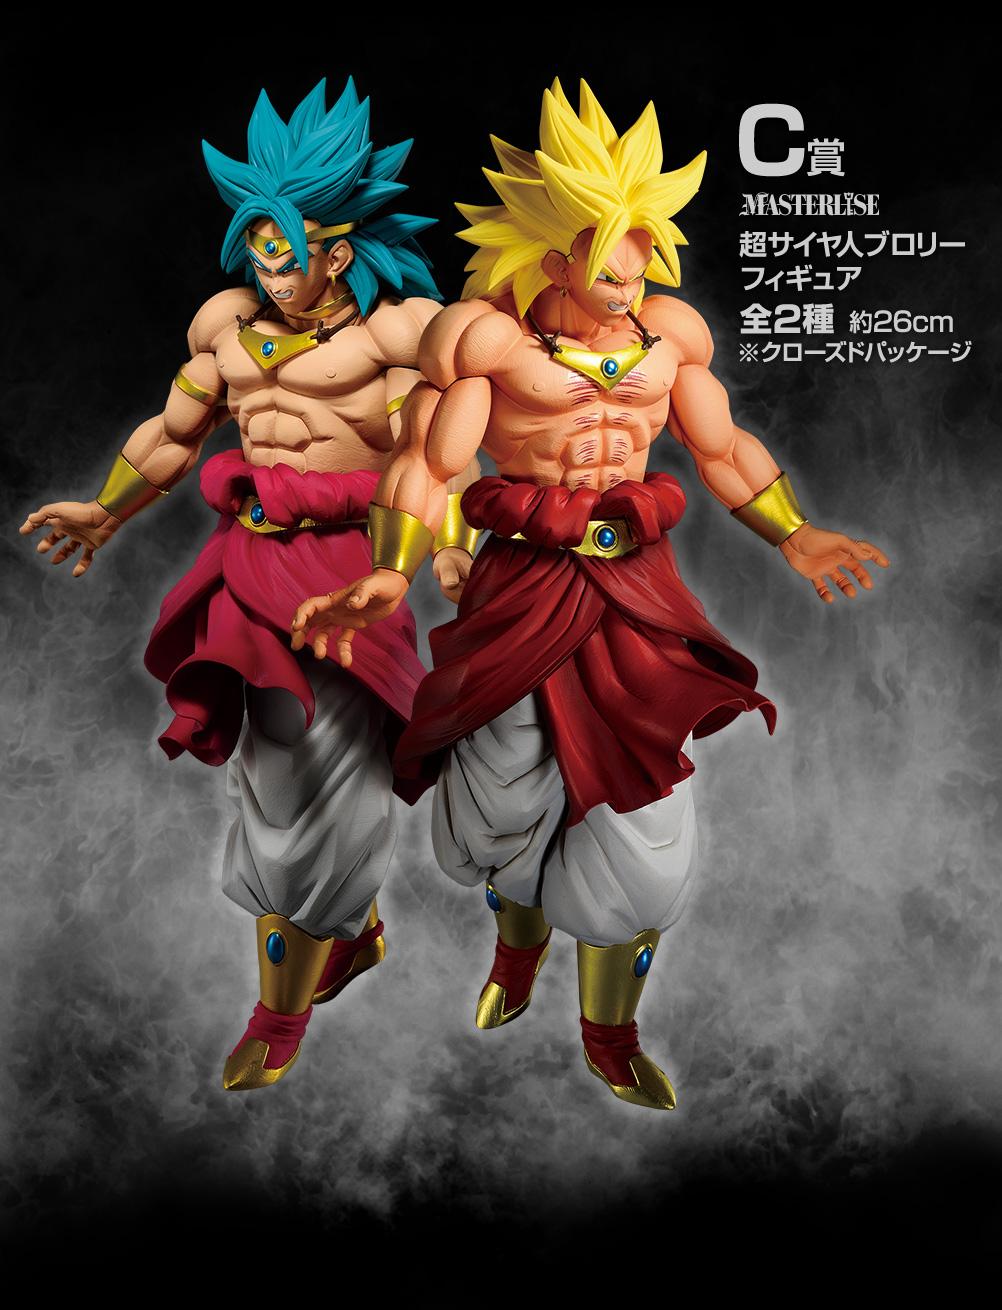 Ichiban Kuji Dragon Ball Back To The Film